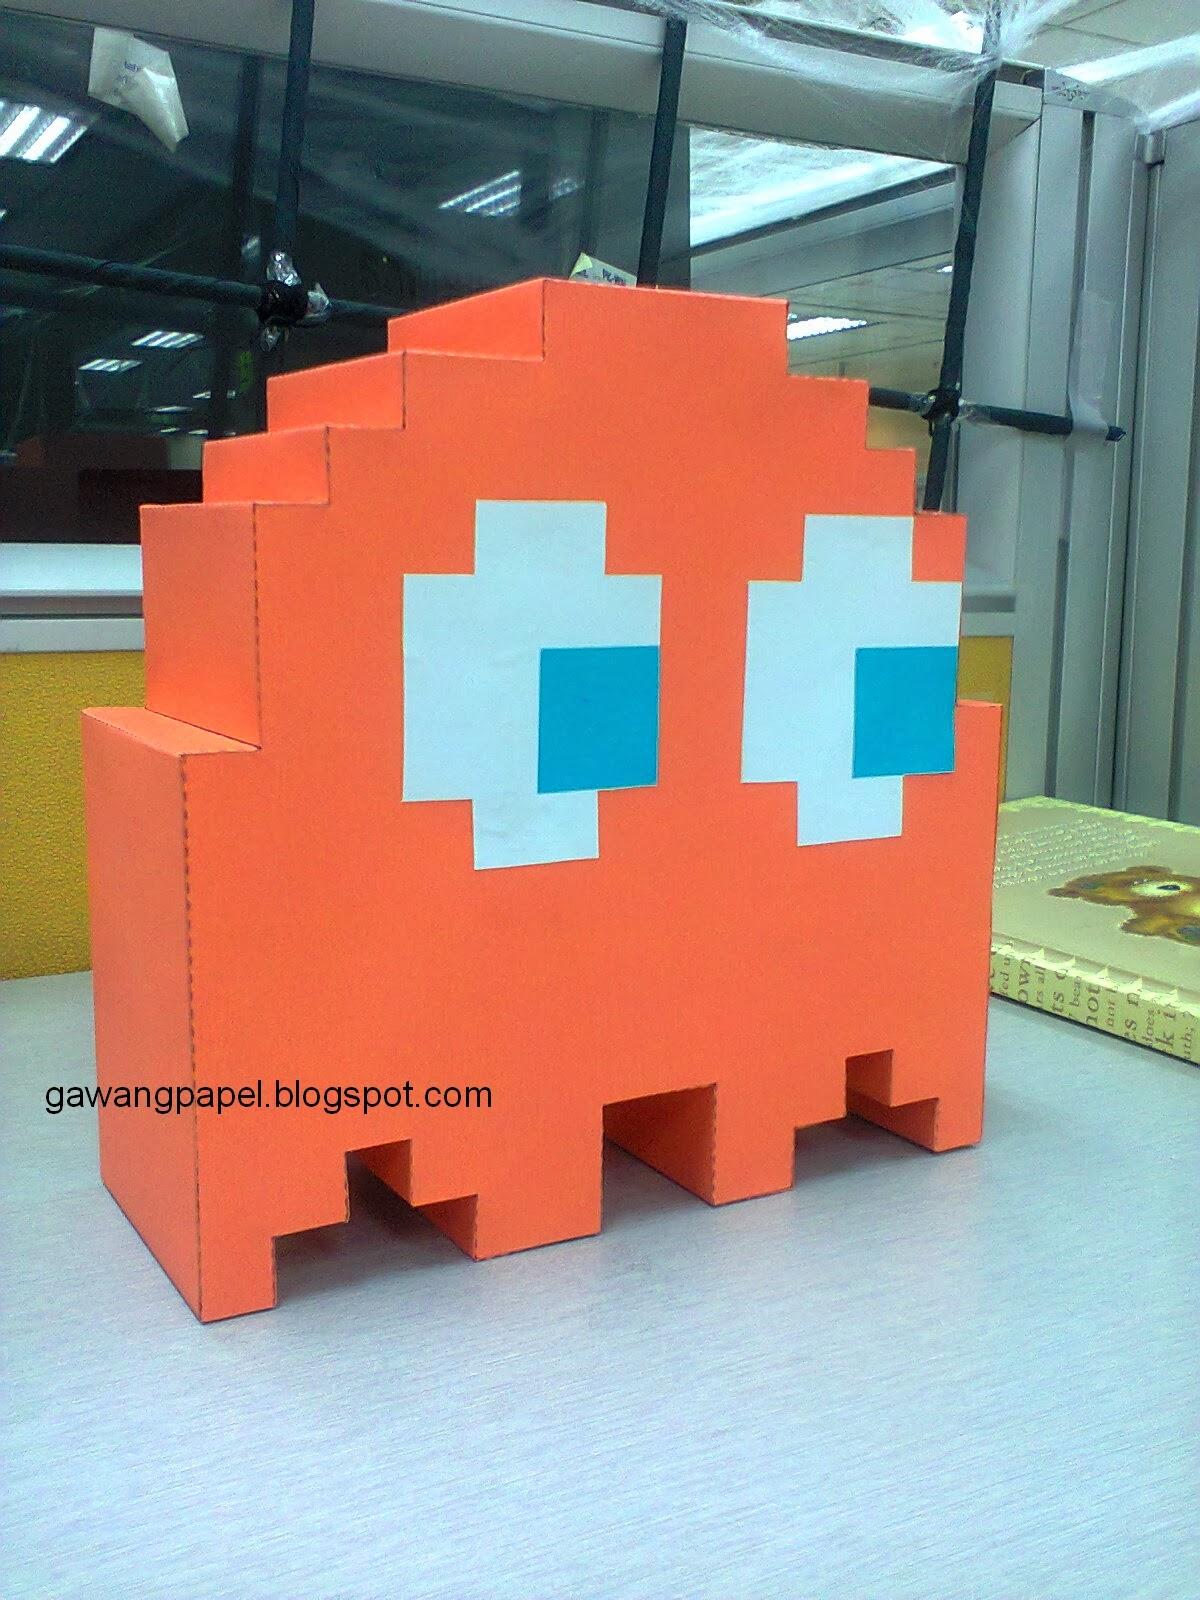 8Bit PacMan Ghosts Papercraft